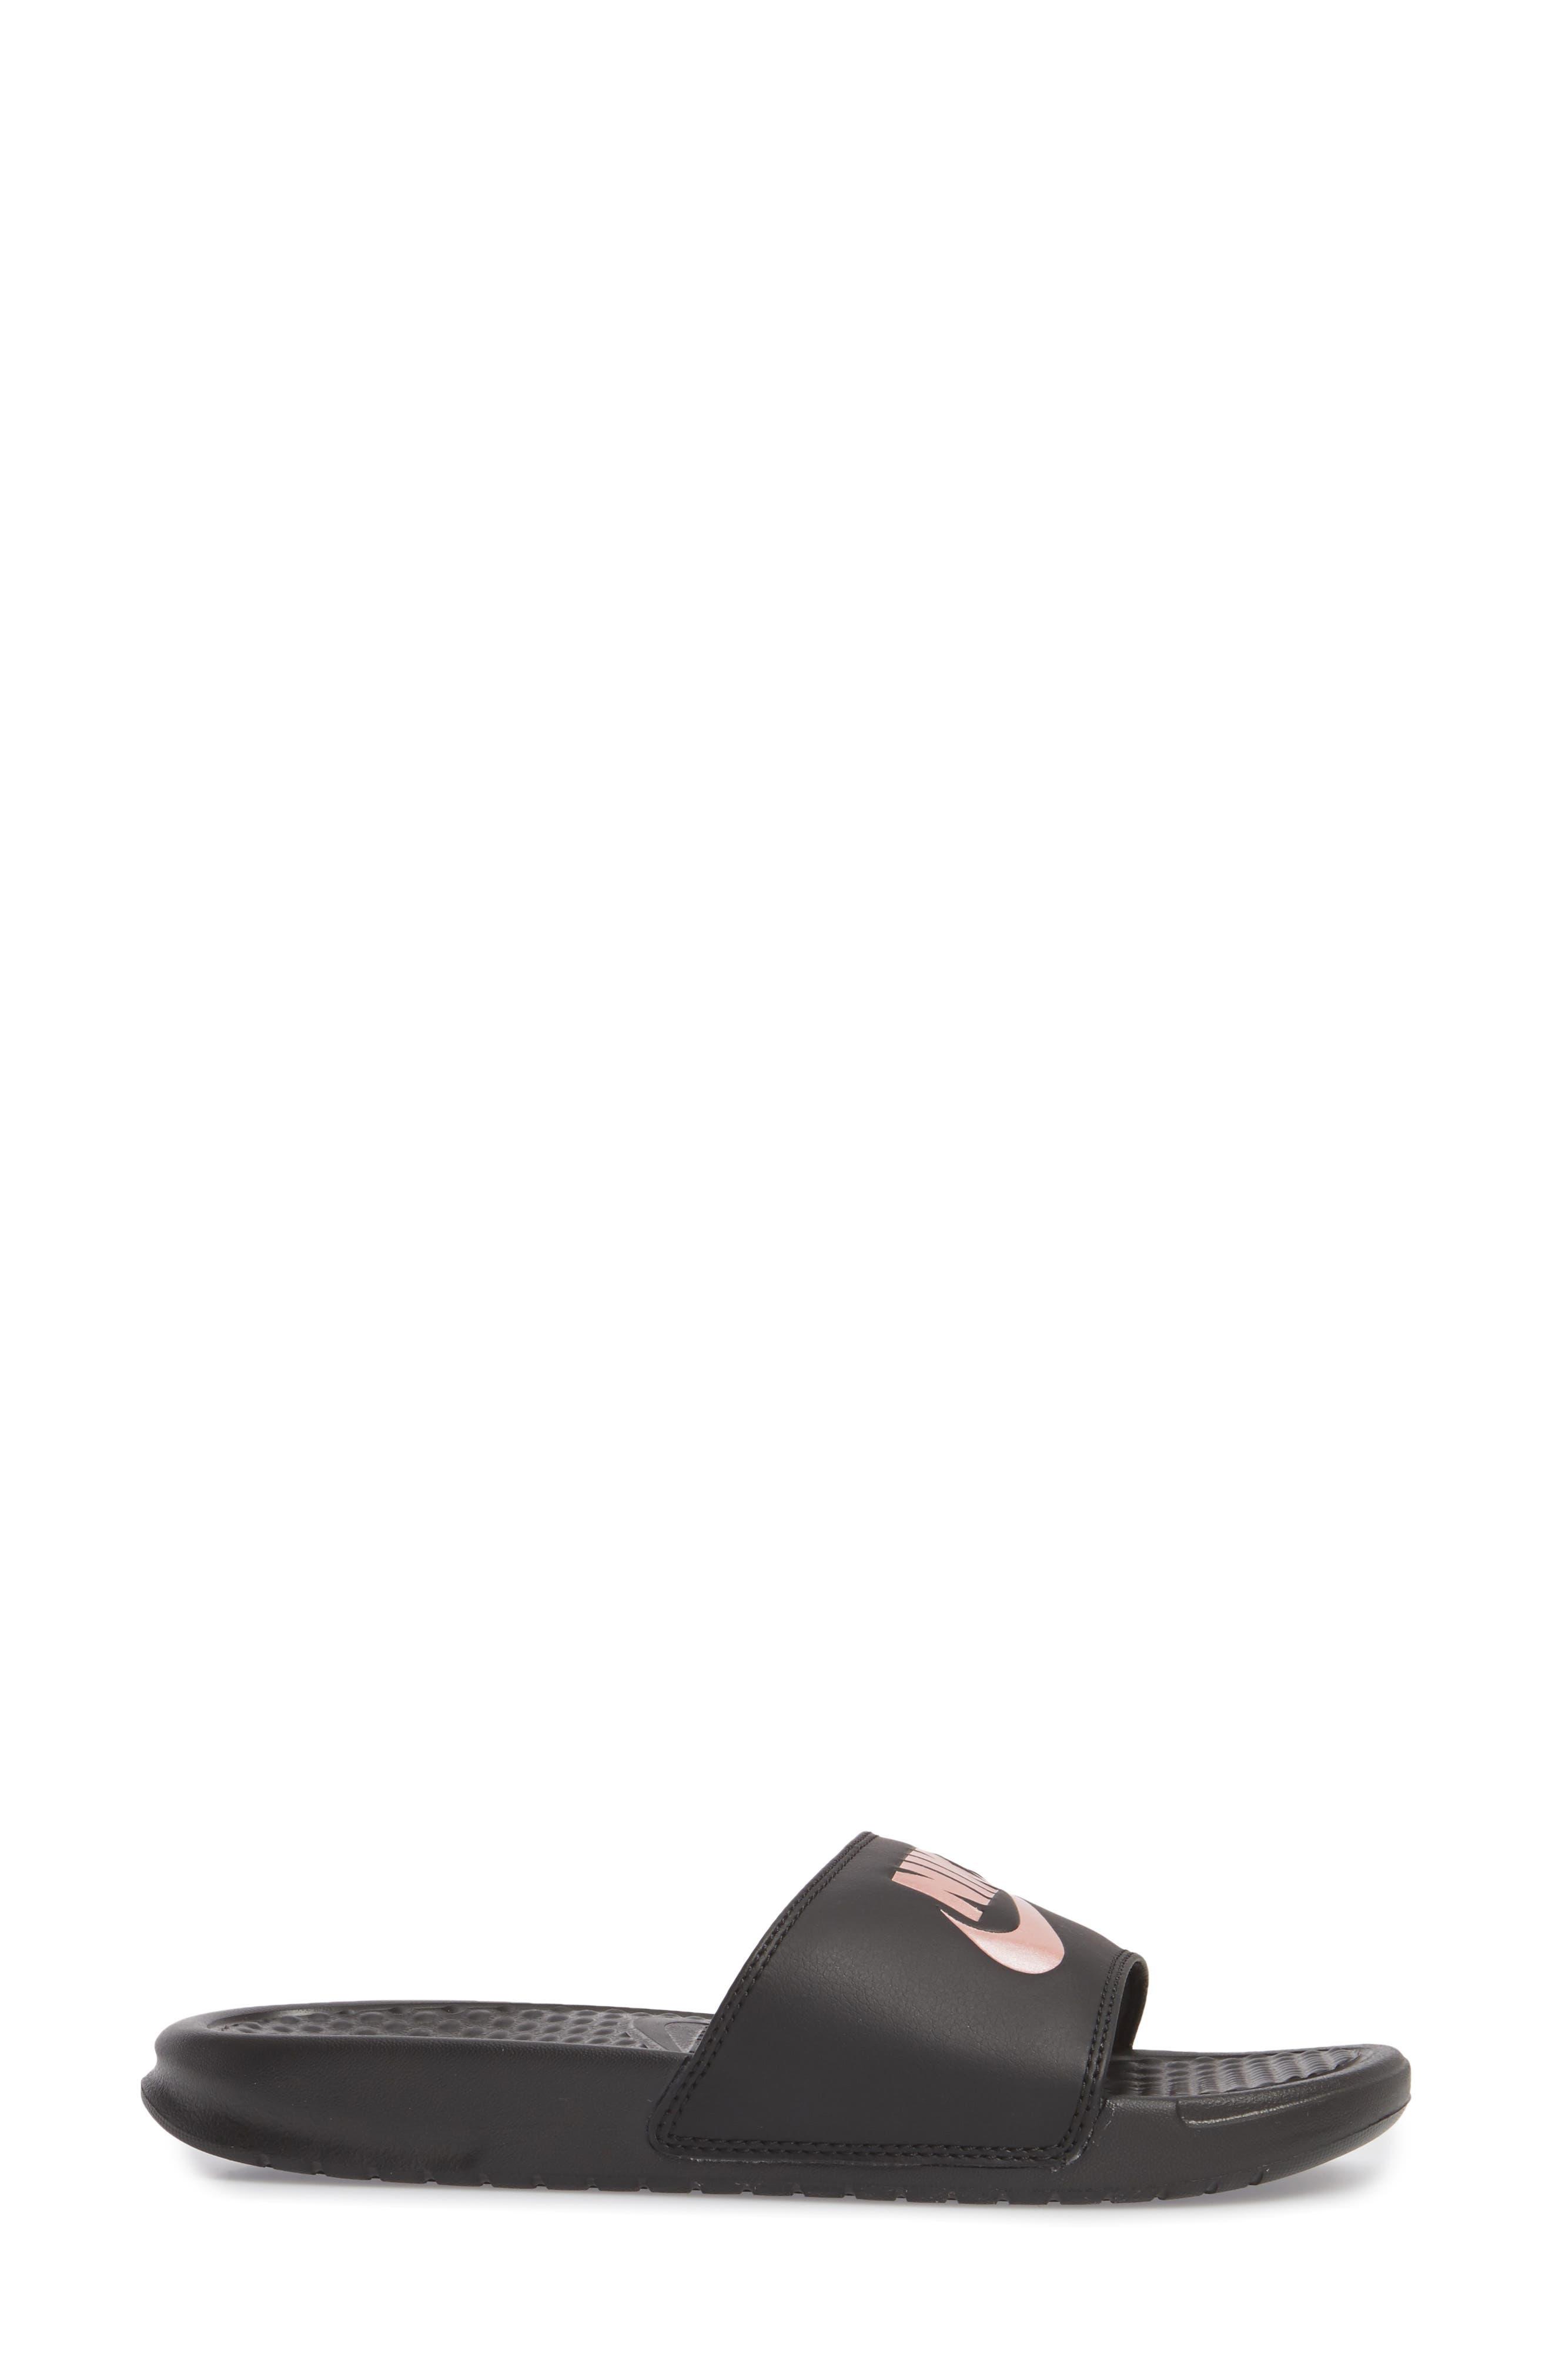 Benassi JDI Slide Sandal,                             Alternate thumbnail 3, color,                             007